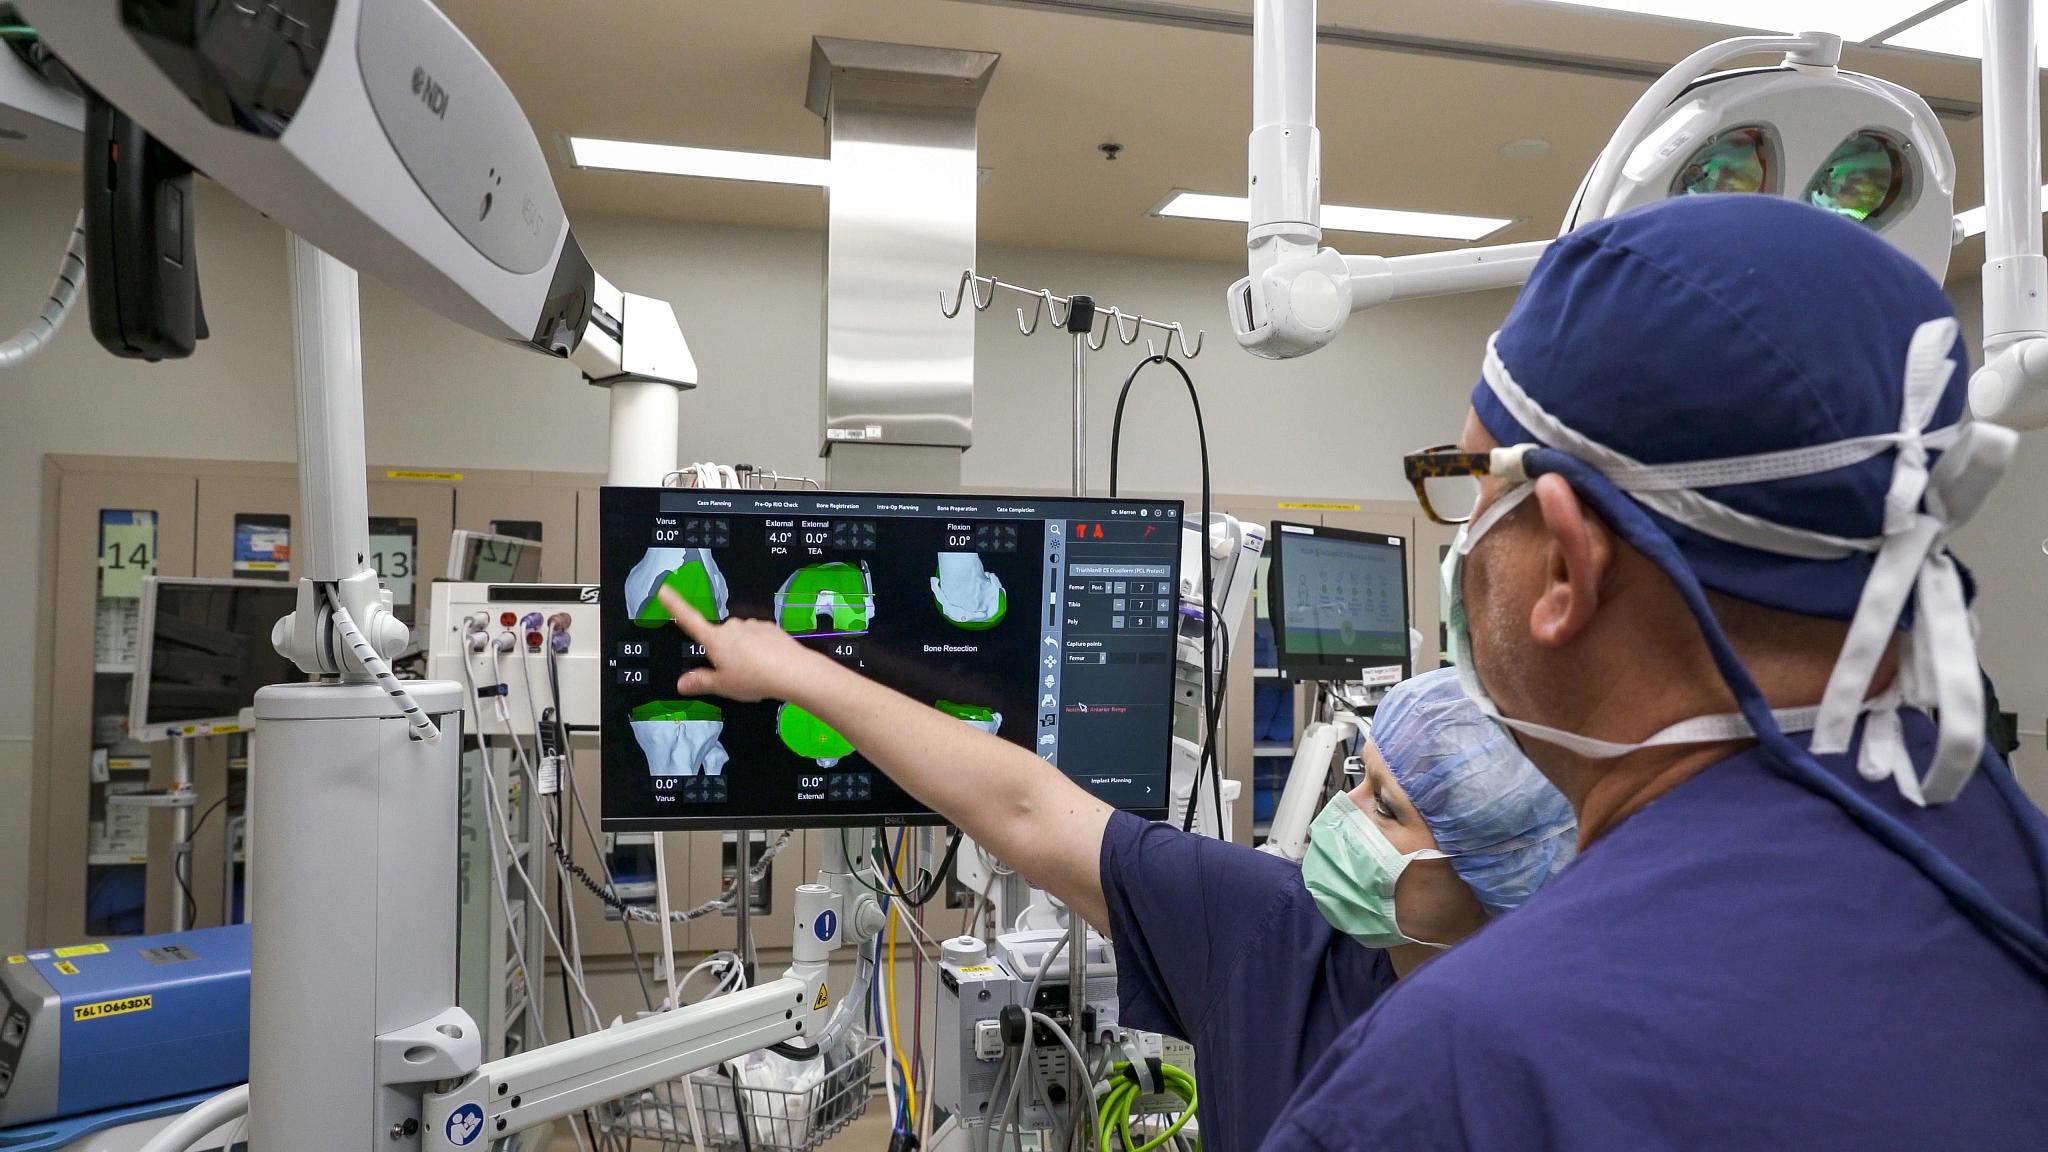 Photo_Robot.Surgery_WilliamsKim_LookingAtScreen.jpg